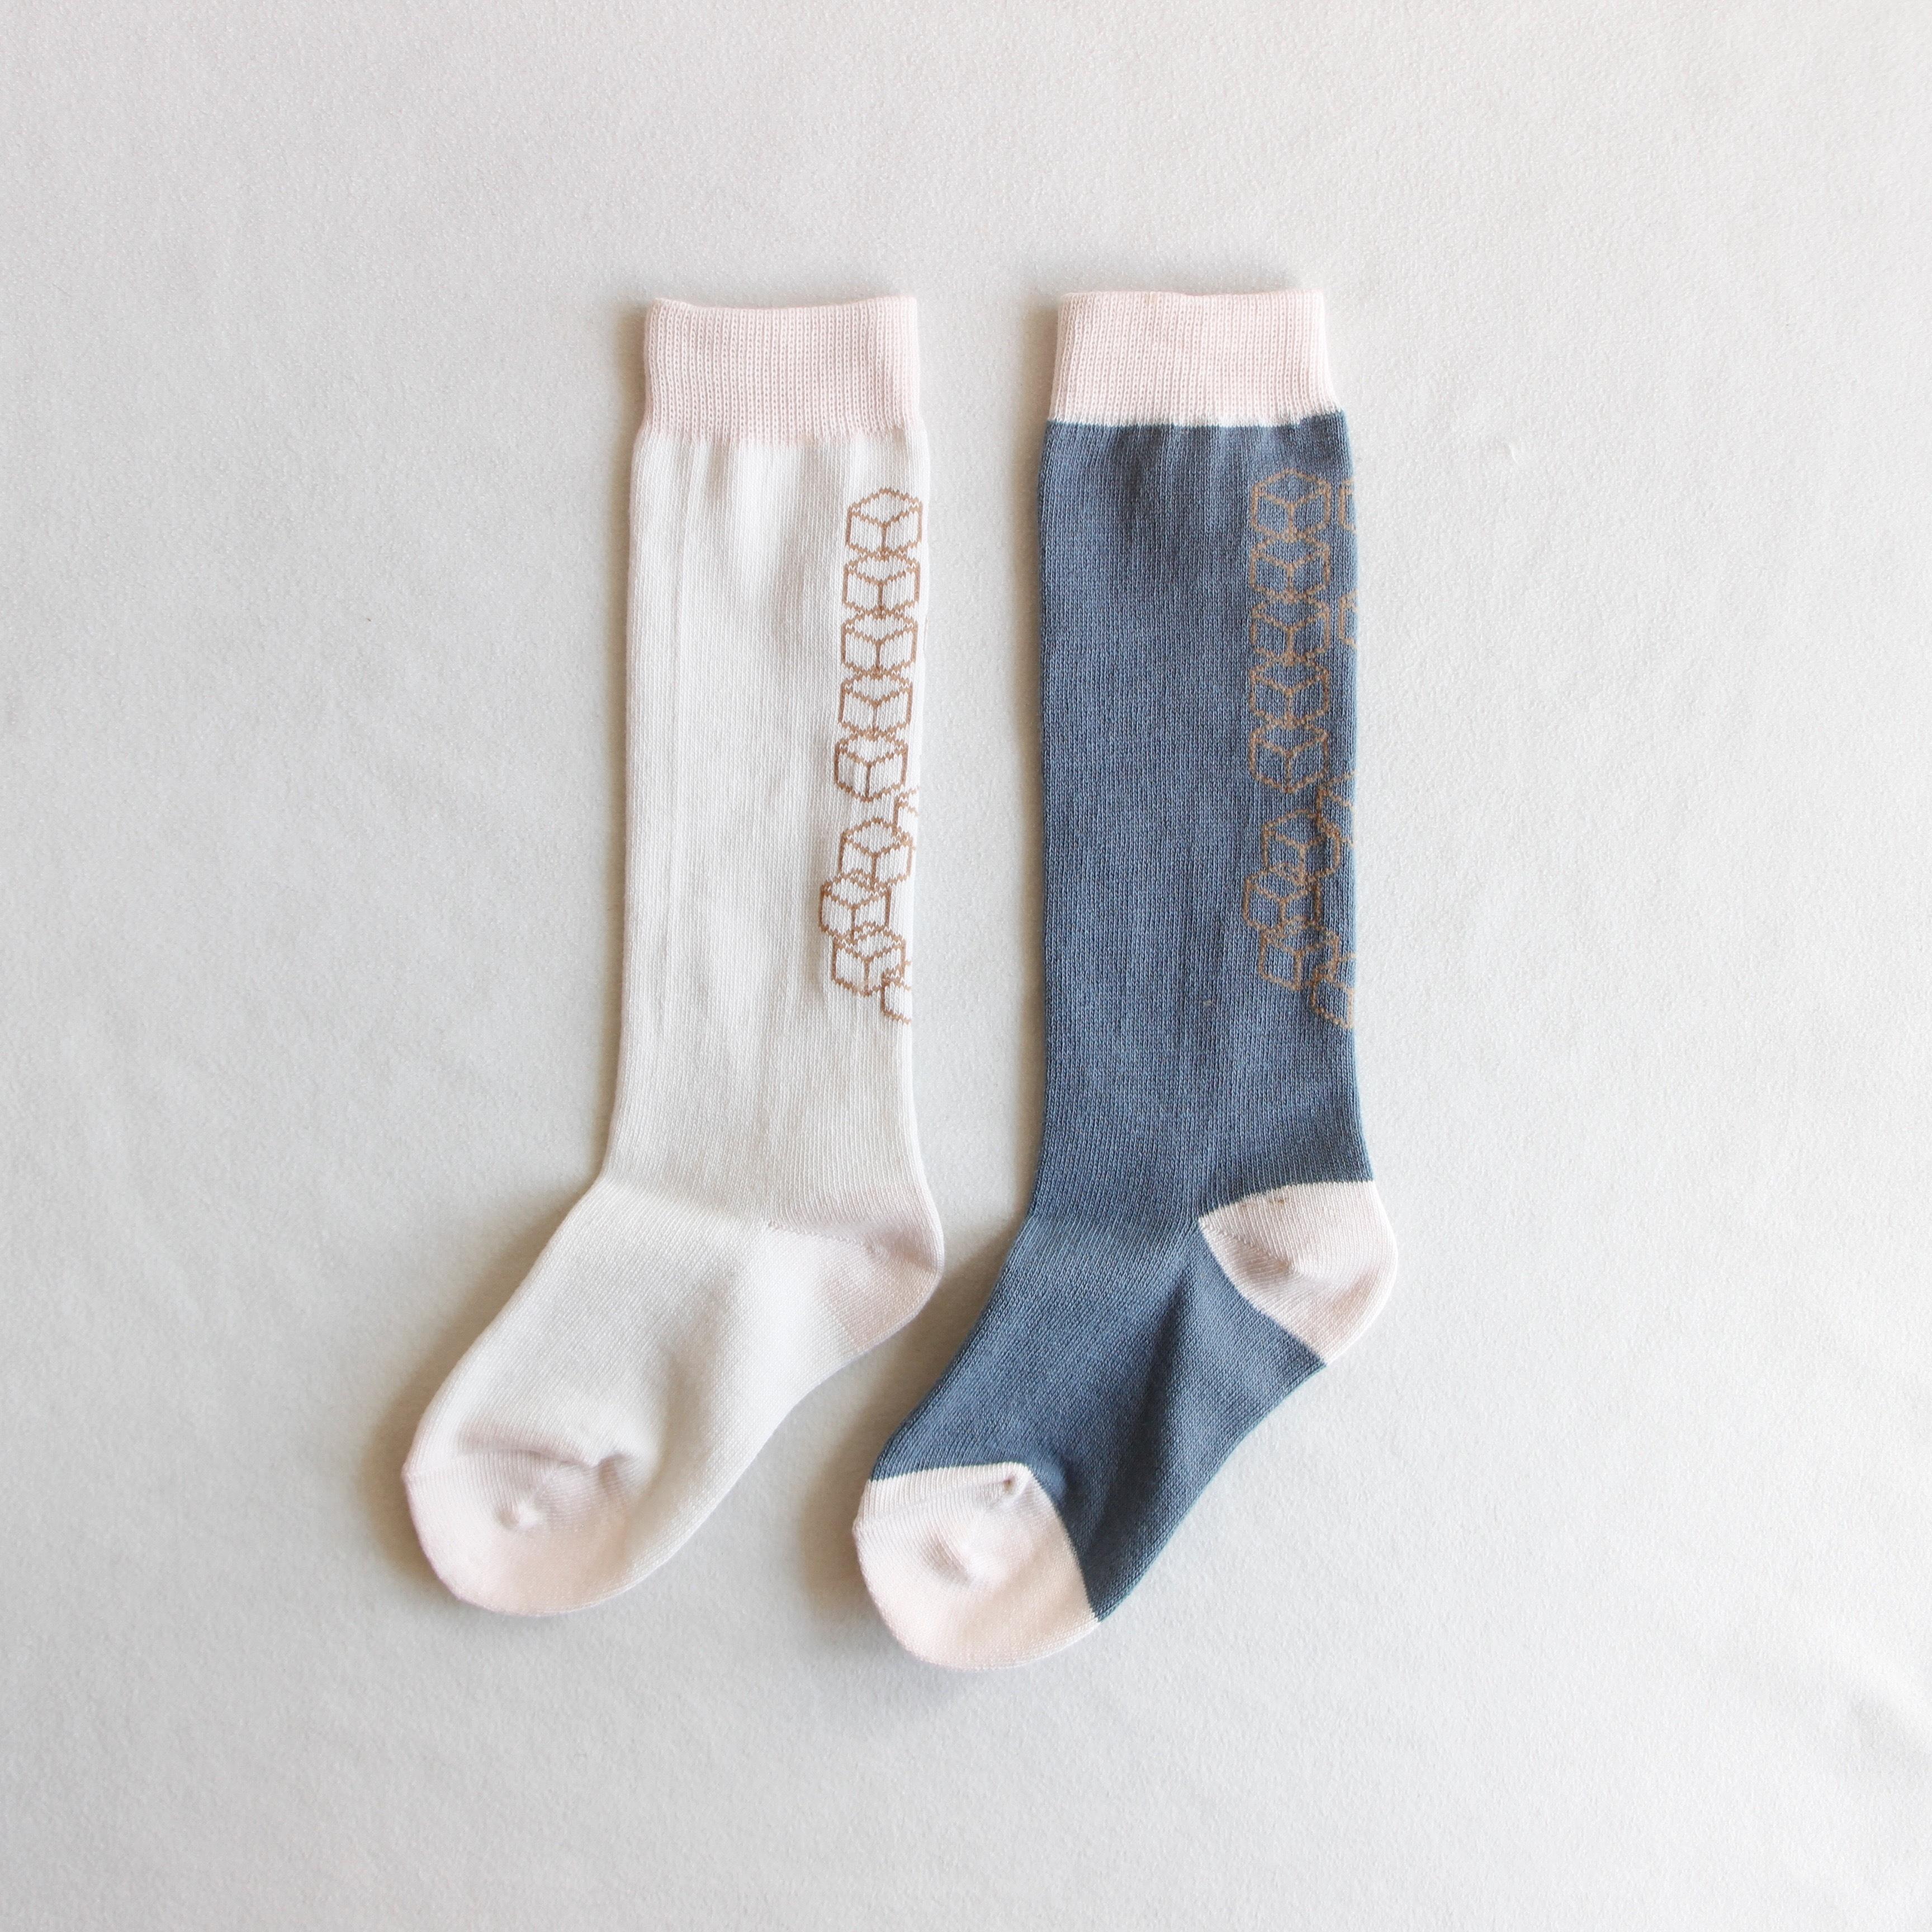 《frankygrow 2020SS》CUBE POP SOCKS / white × gray / S・M・L